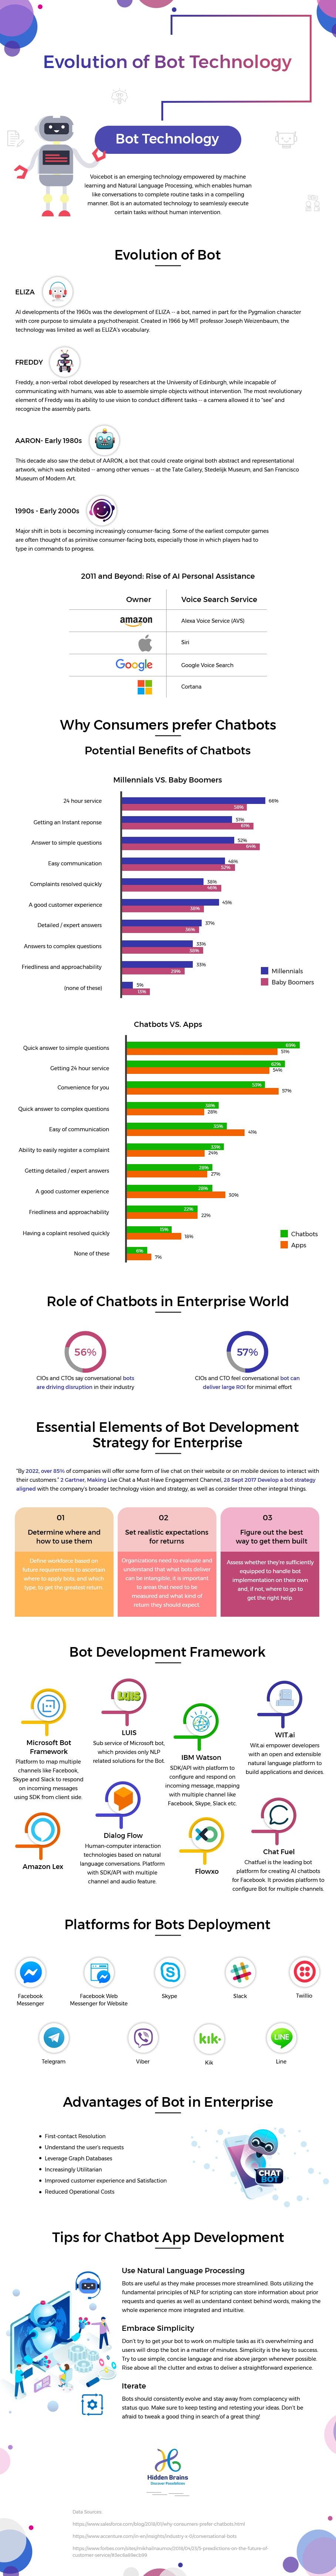 Evolution-of-Bot-Technology-infographic-plaza